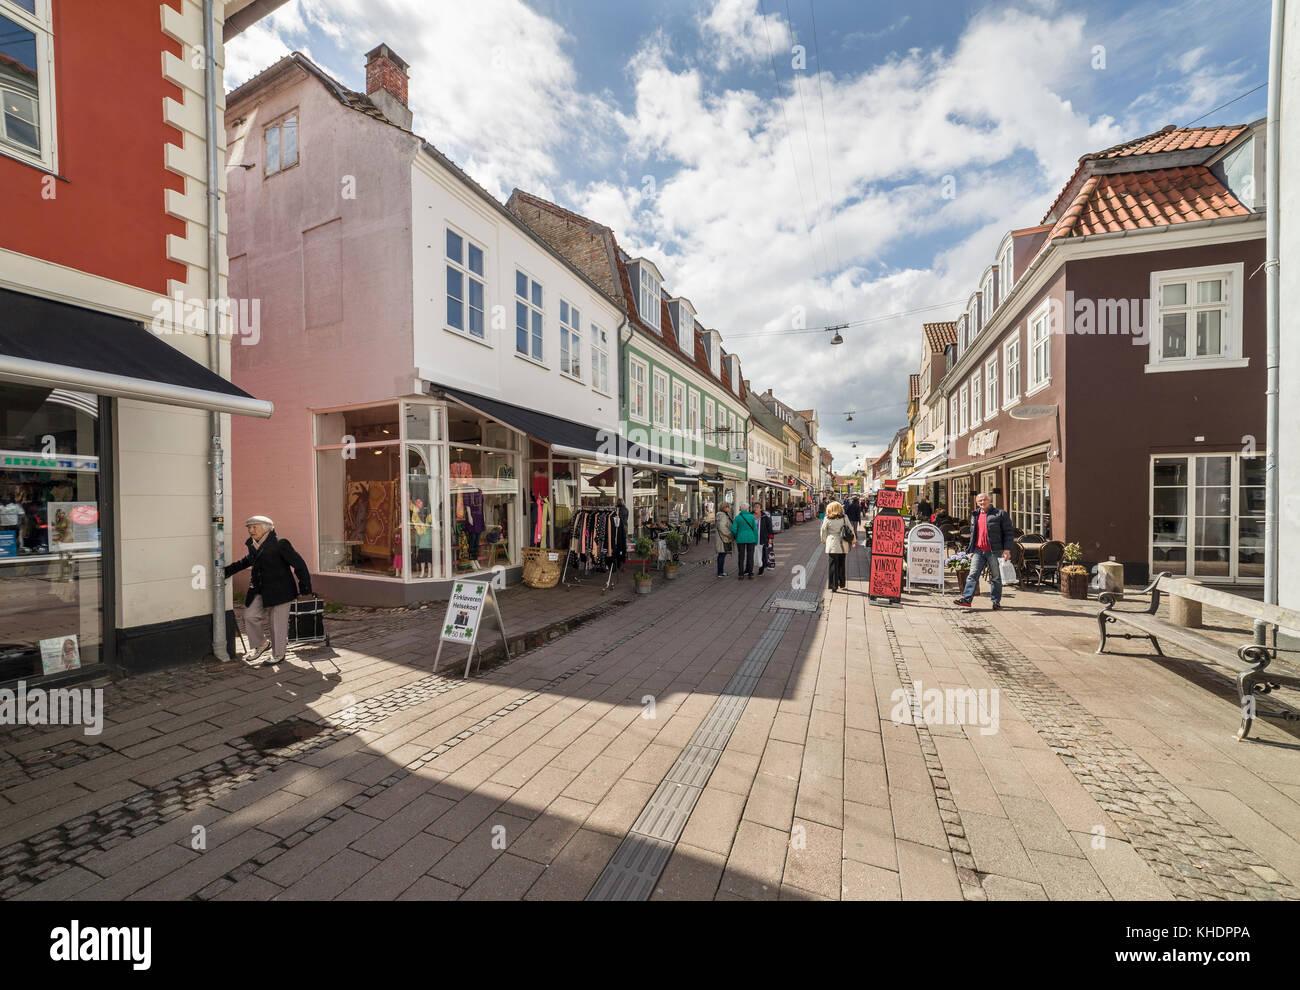 Stengade shopping and pedestrian street in the medieval town center of Helsingor / Helsingør, Denmark, Scandinavia. - Stock Image